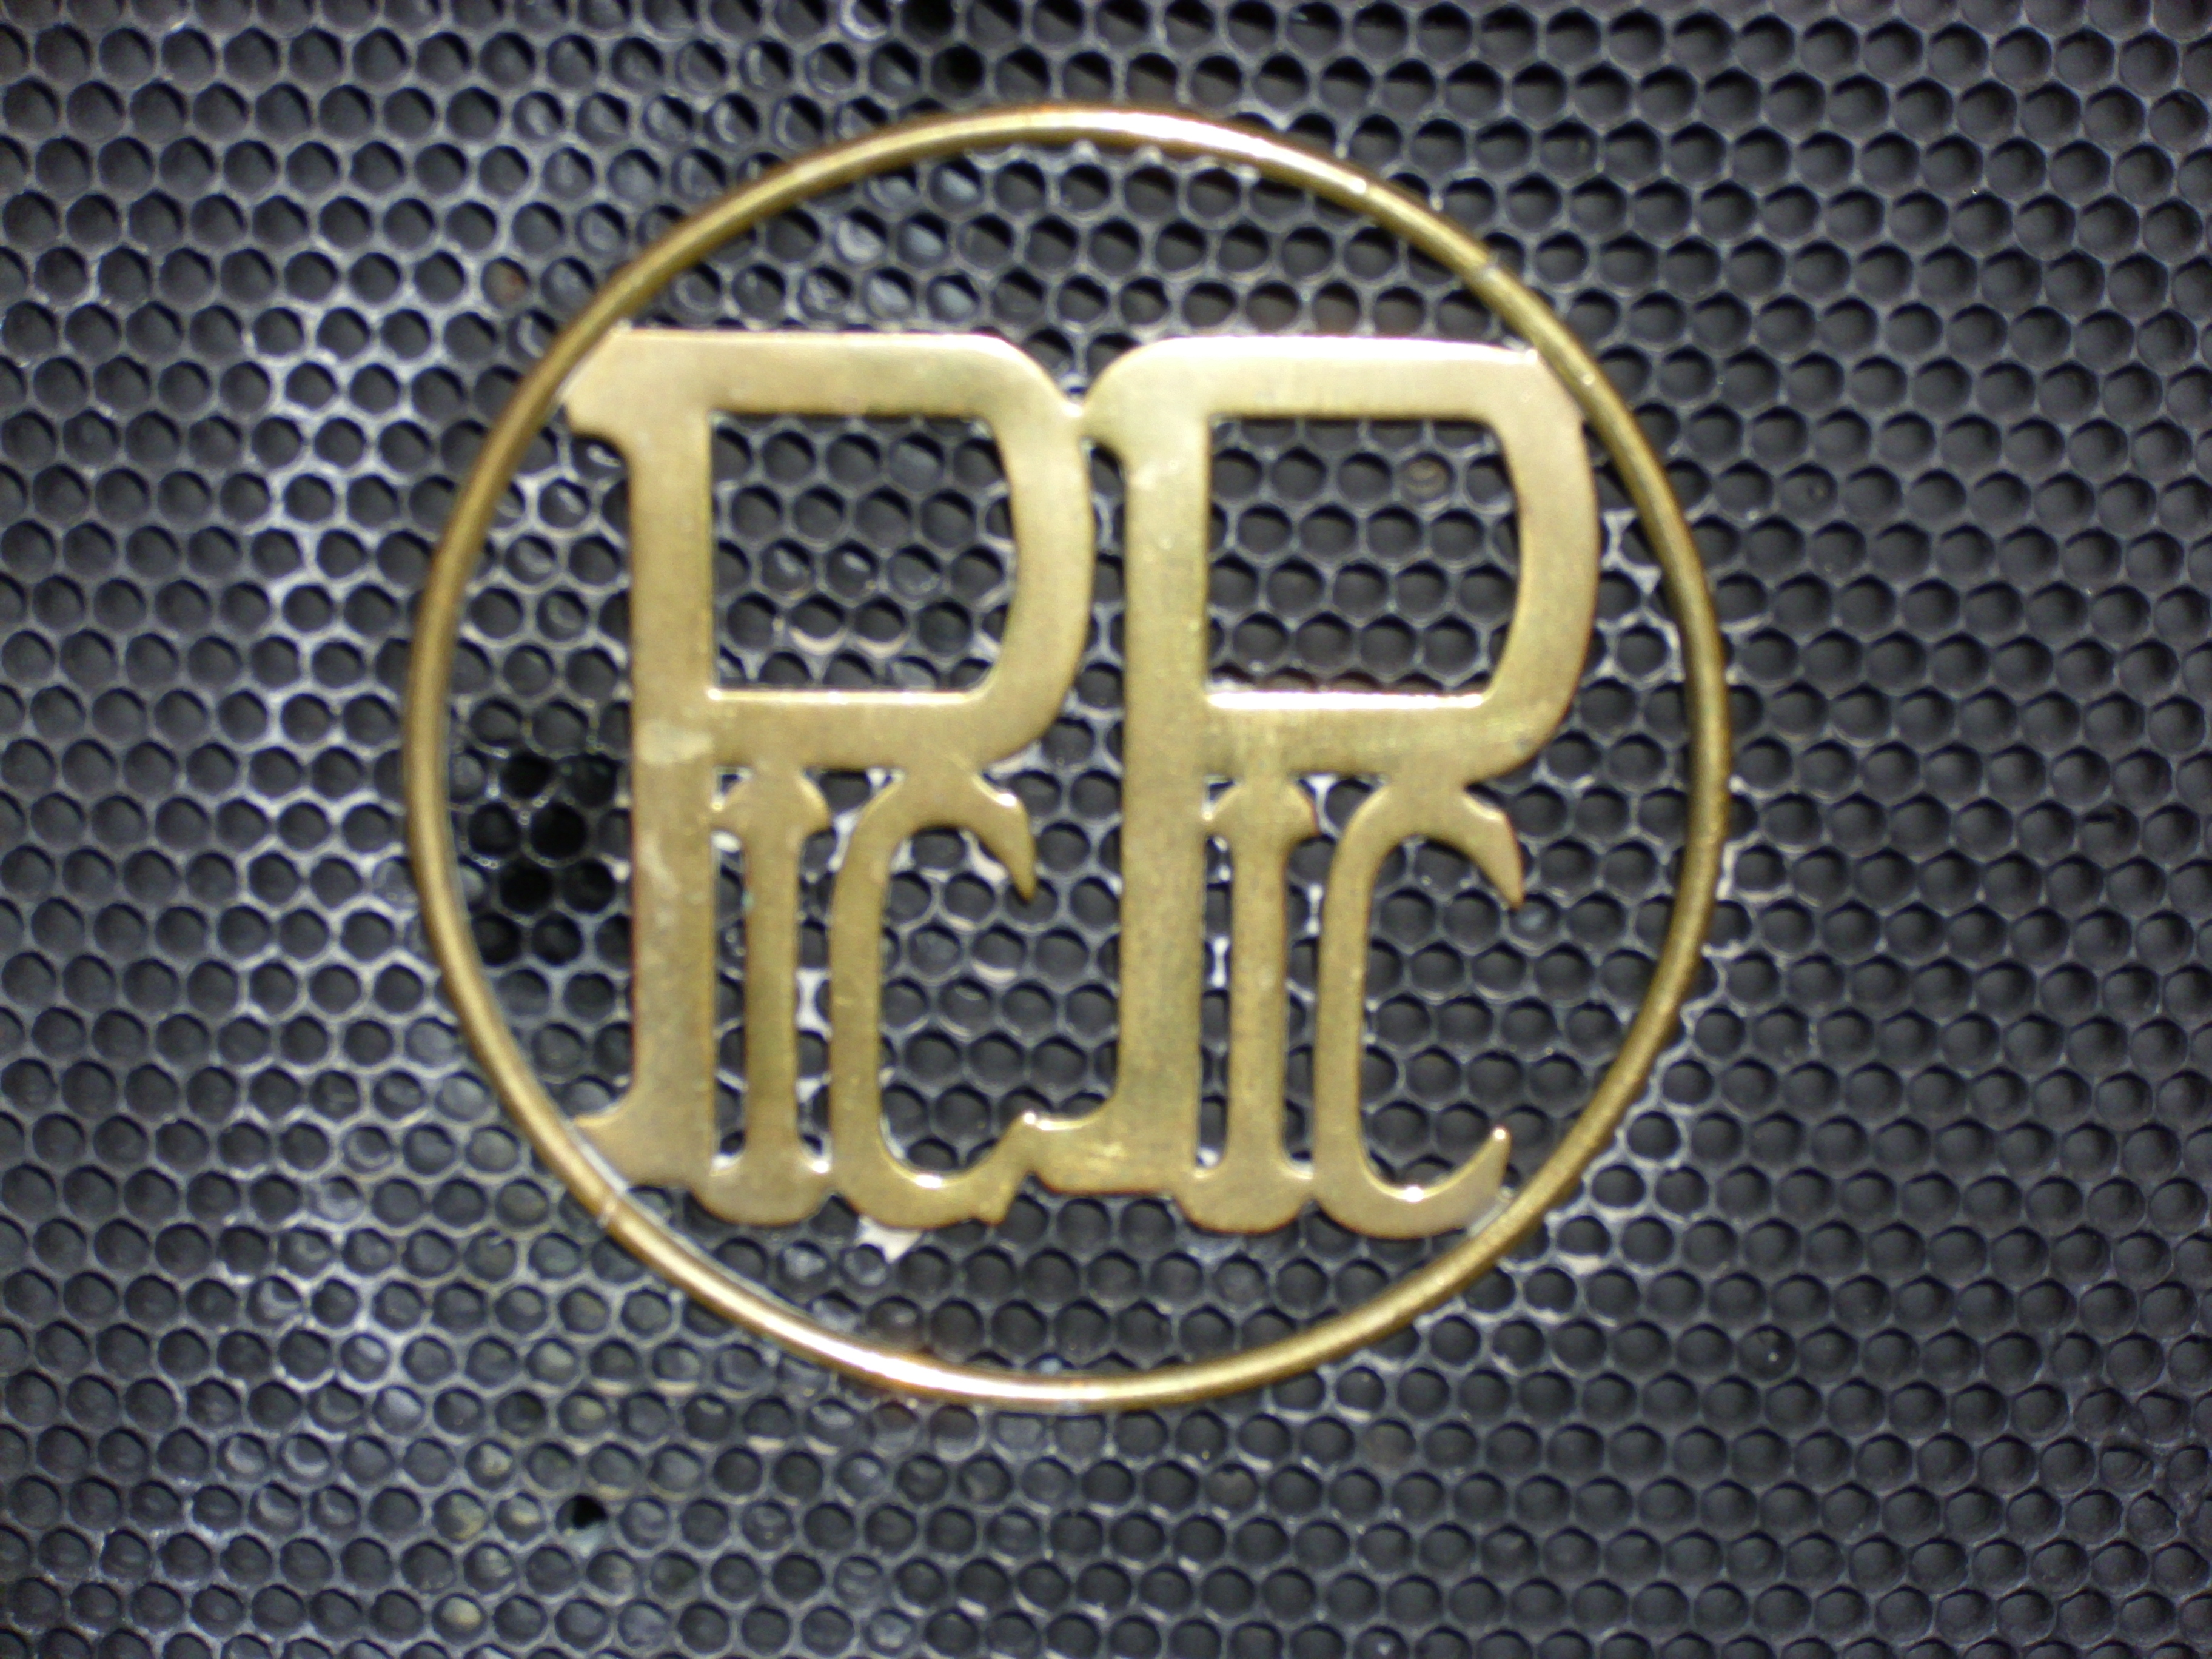 Https Commons Wikimedia Org Wiki File Emblem Pic Pic Jpg